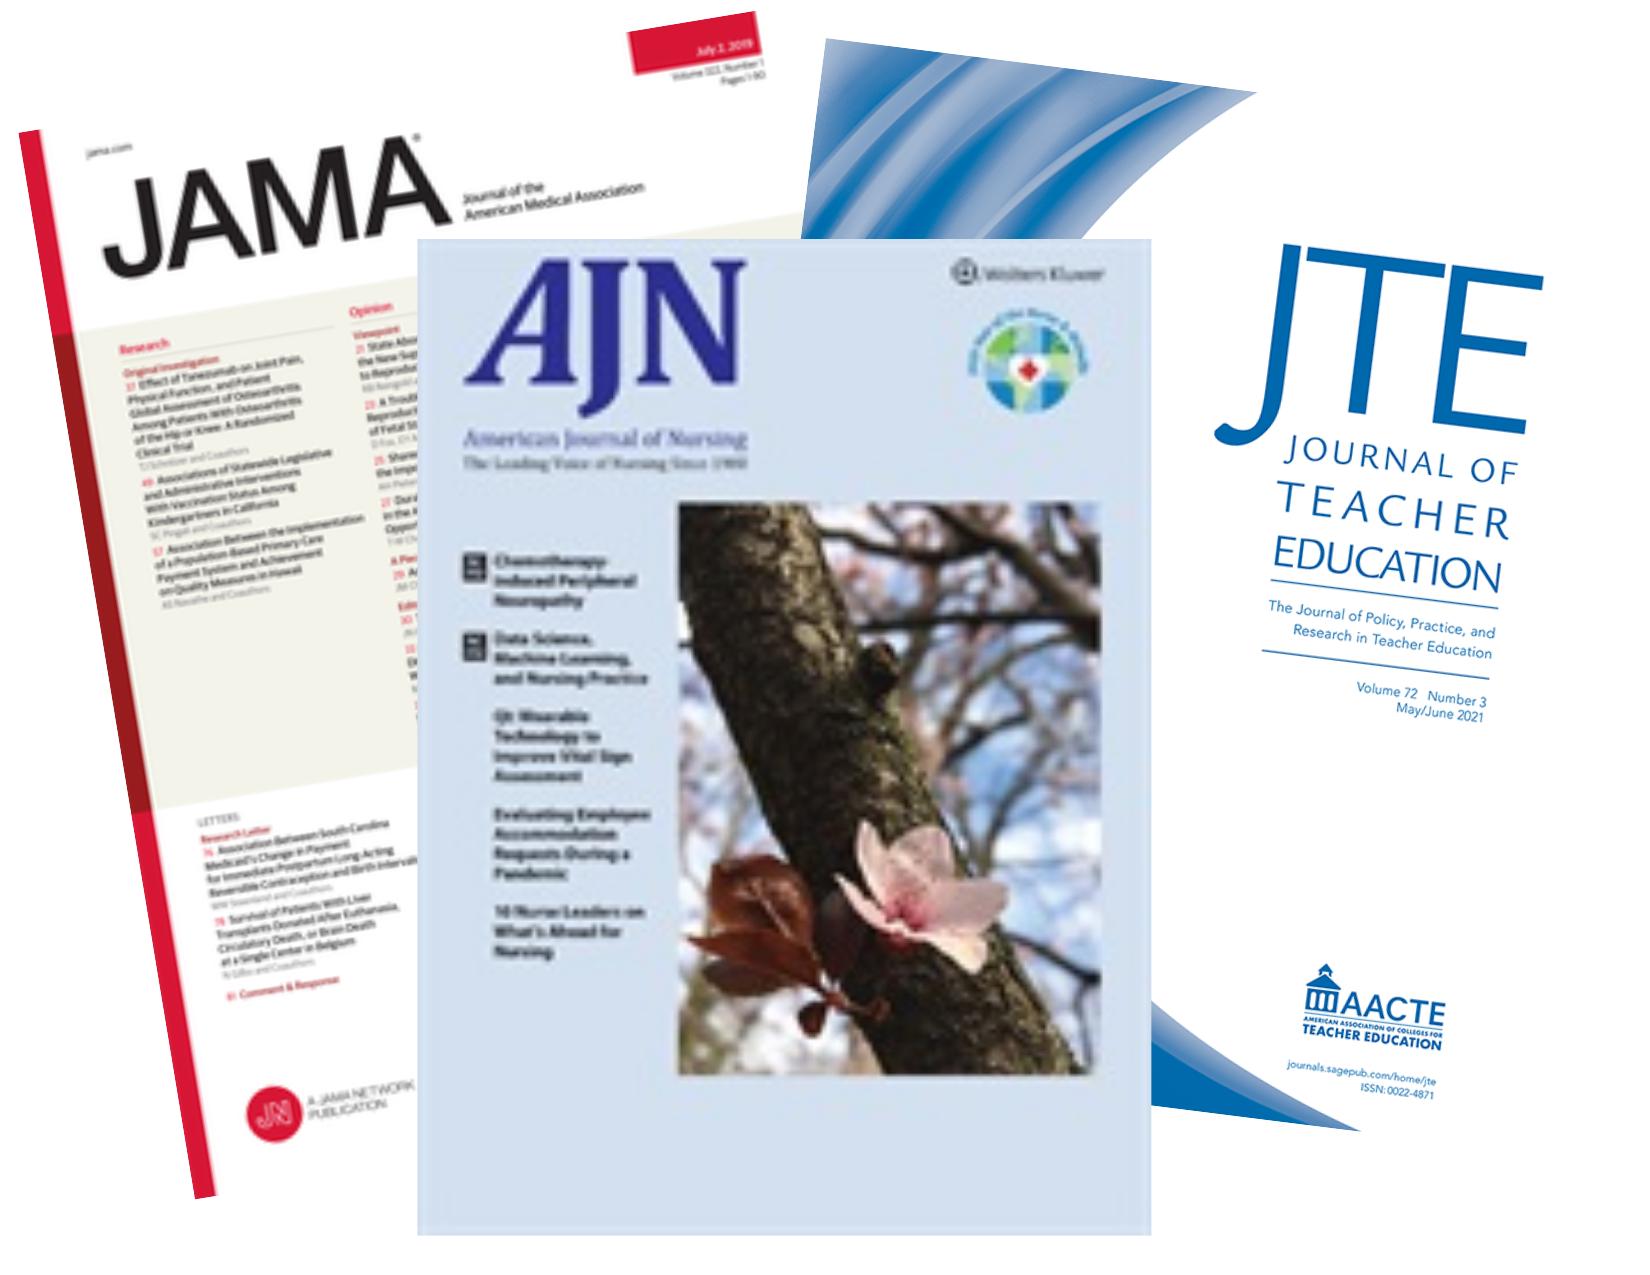 Journal Covers: JAMA, AJN, JTE